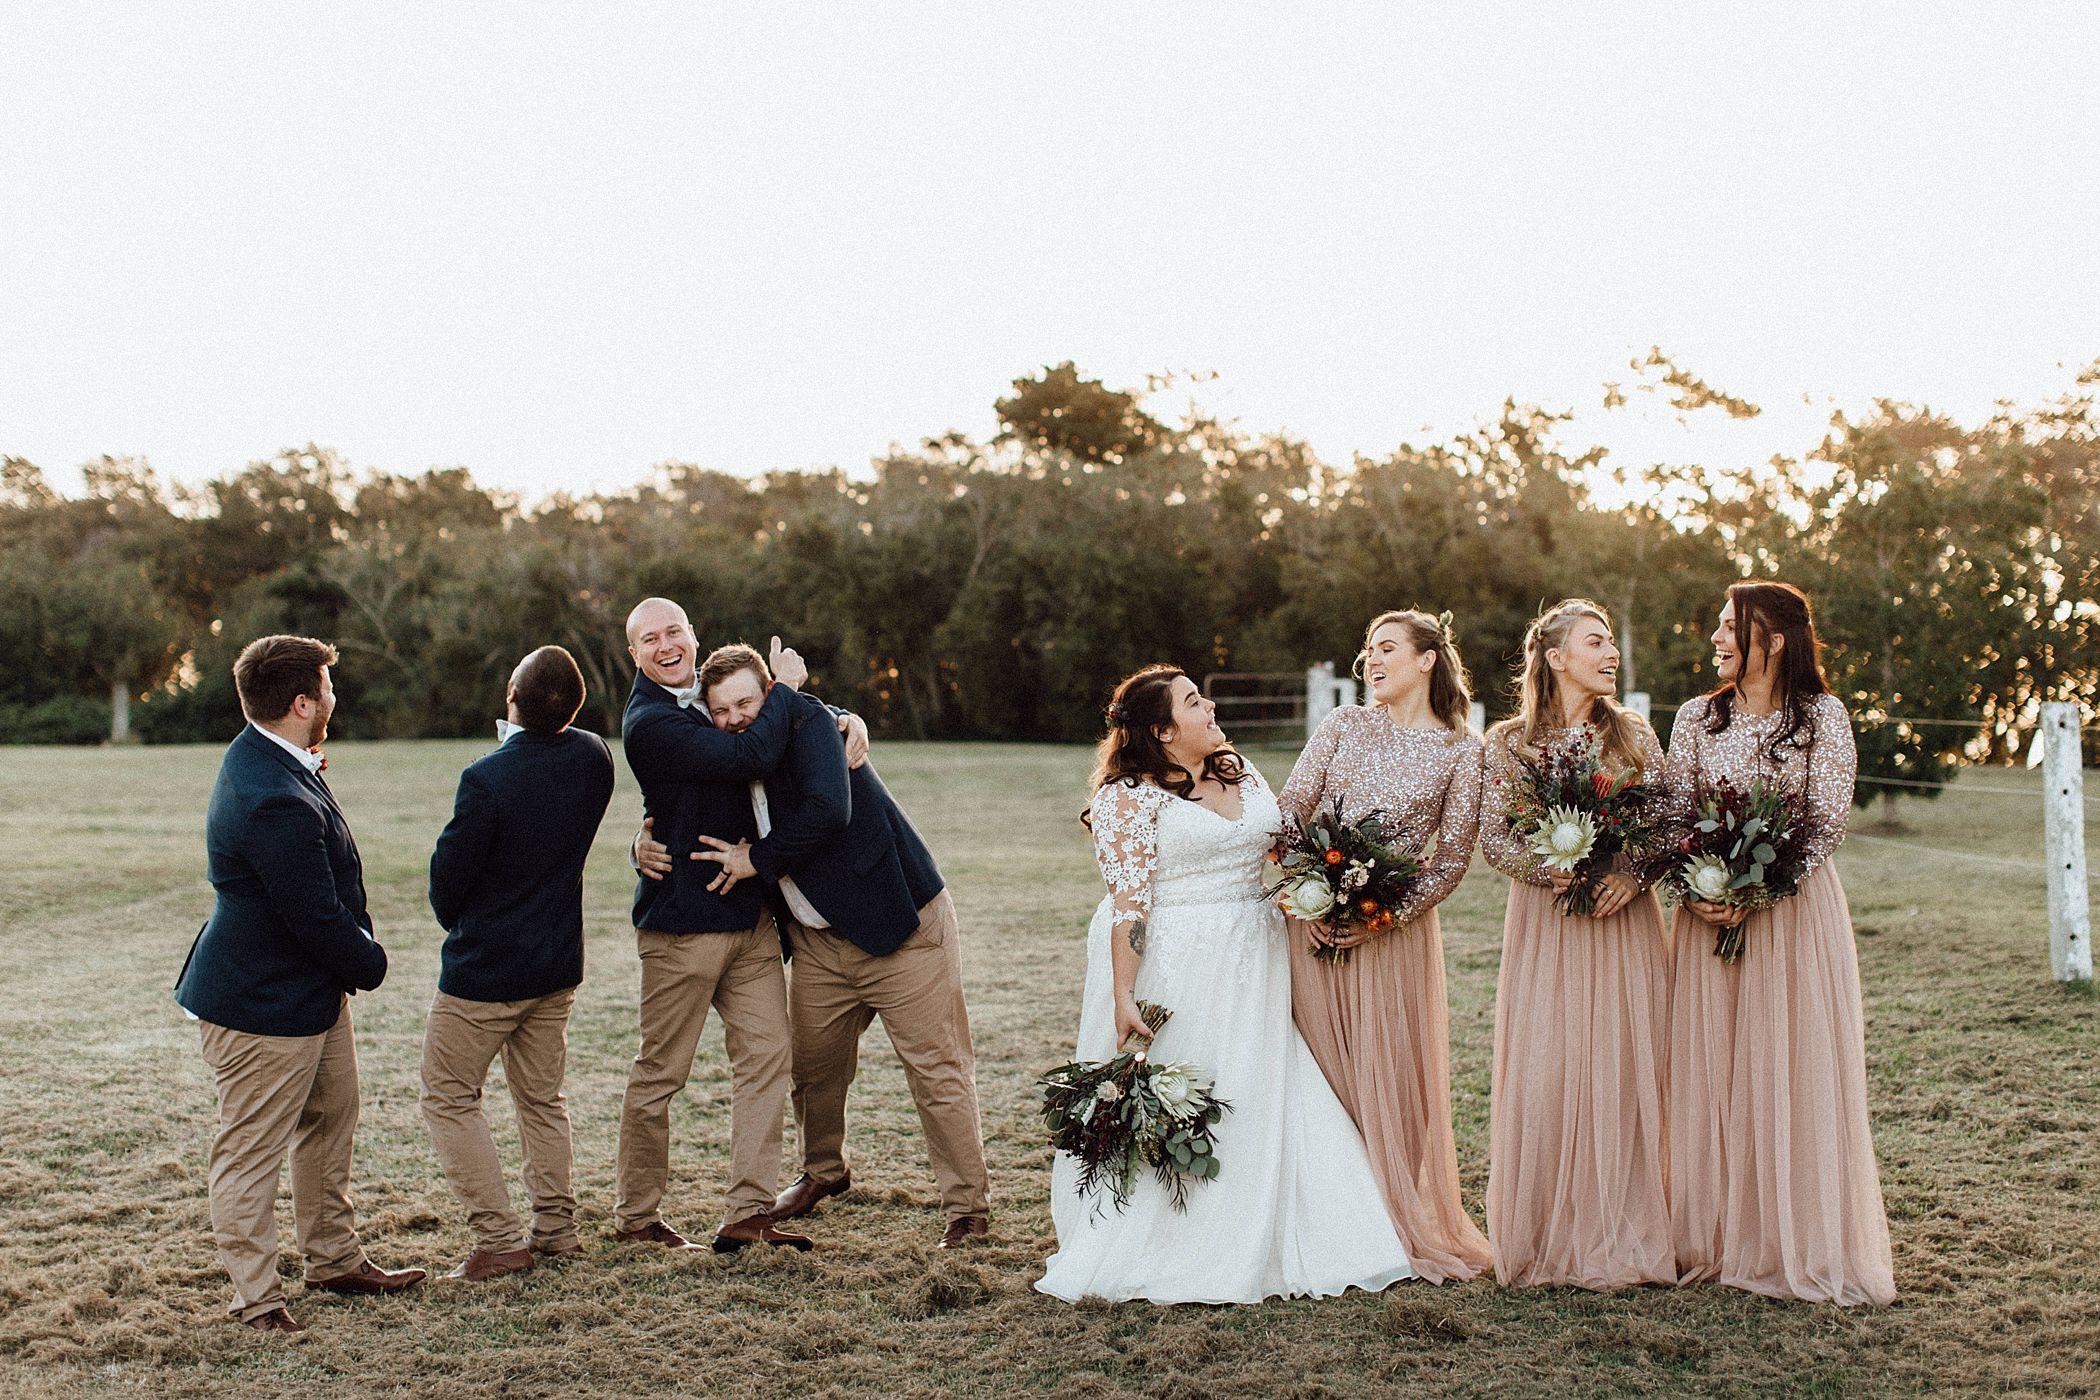 lauren-anne-photography-newcastle-hunter-valley-wedding-photographer_1218.jpg